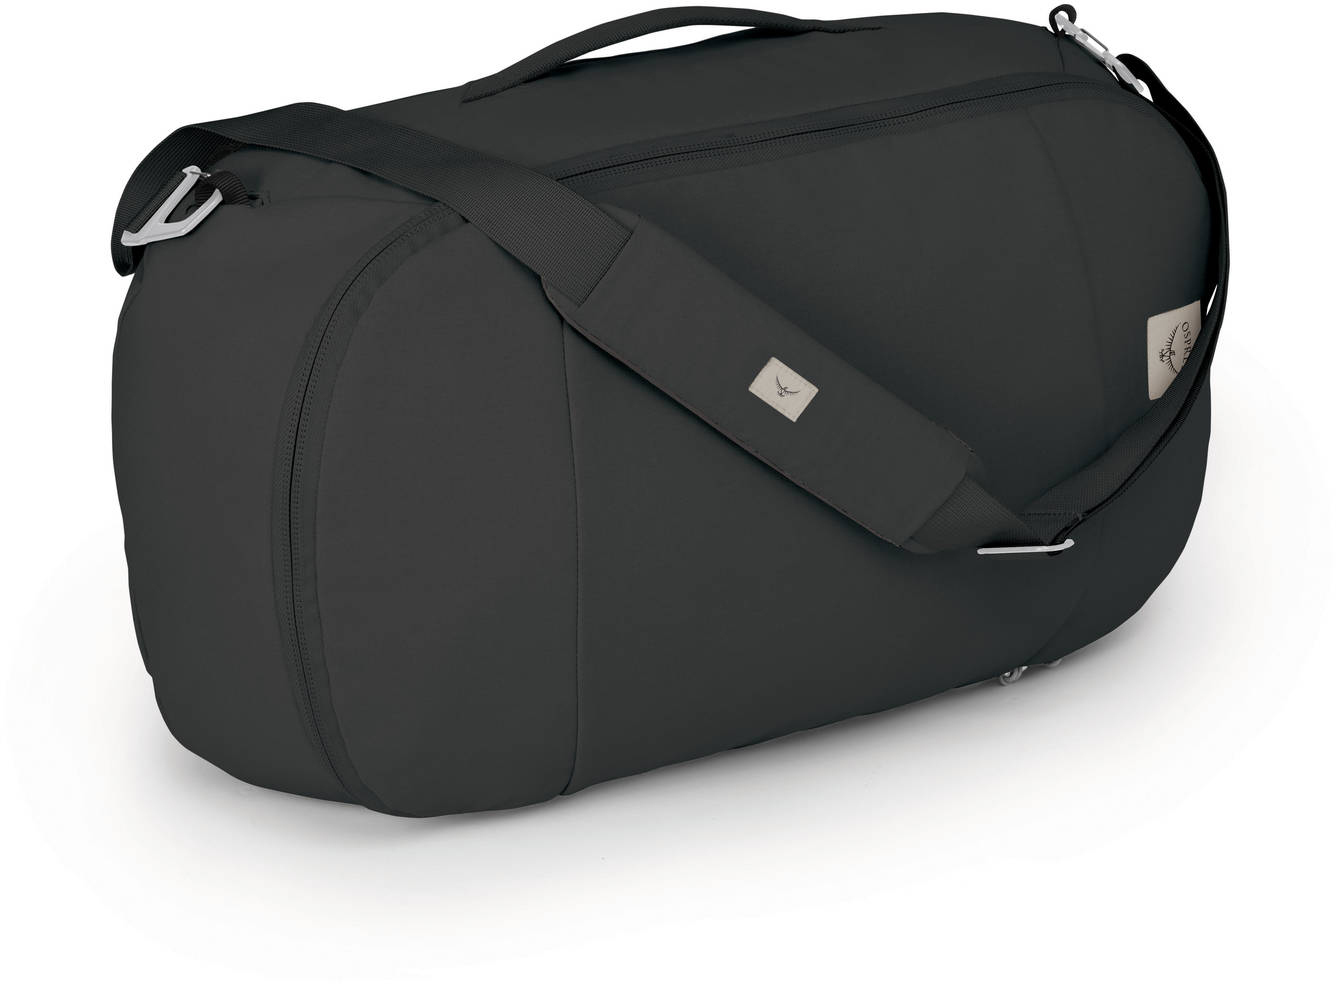 Сумки Сумка рюкзак Osprey Arcane Duffel Stonewash Black Arcane_Duffel_S20_Side_Stonewash_Black_web.jpg